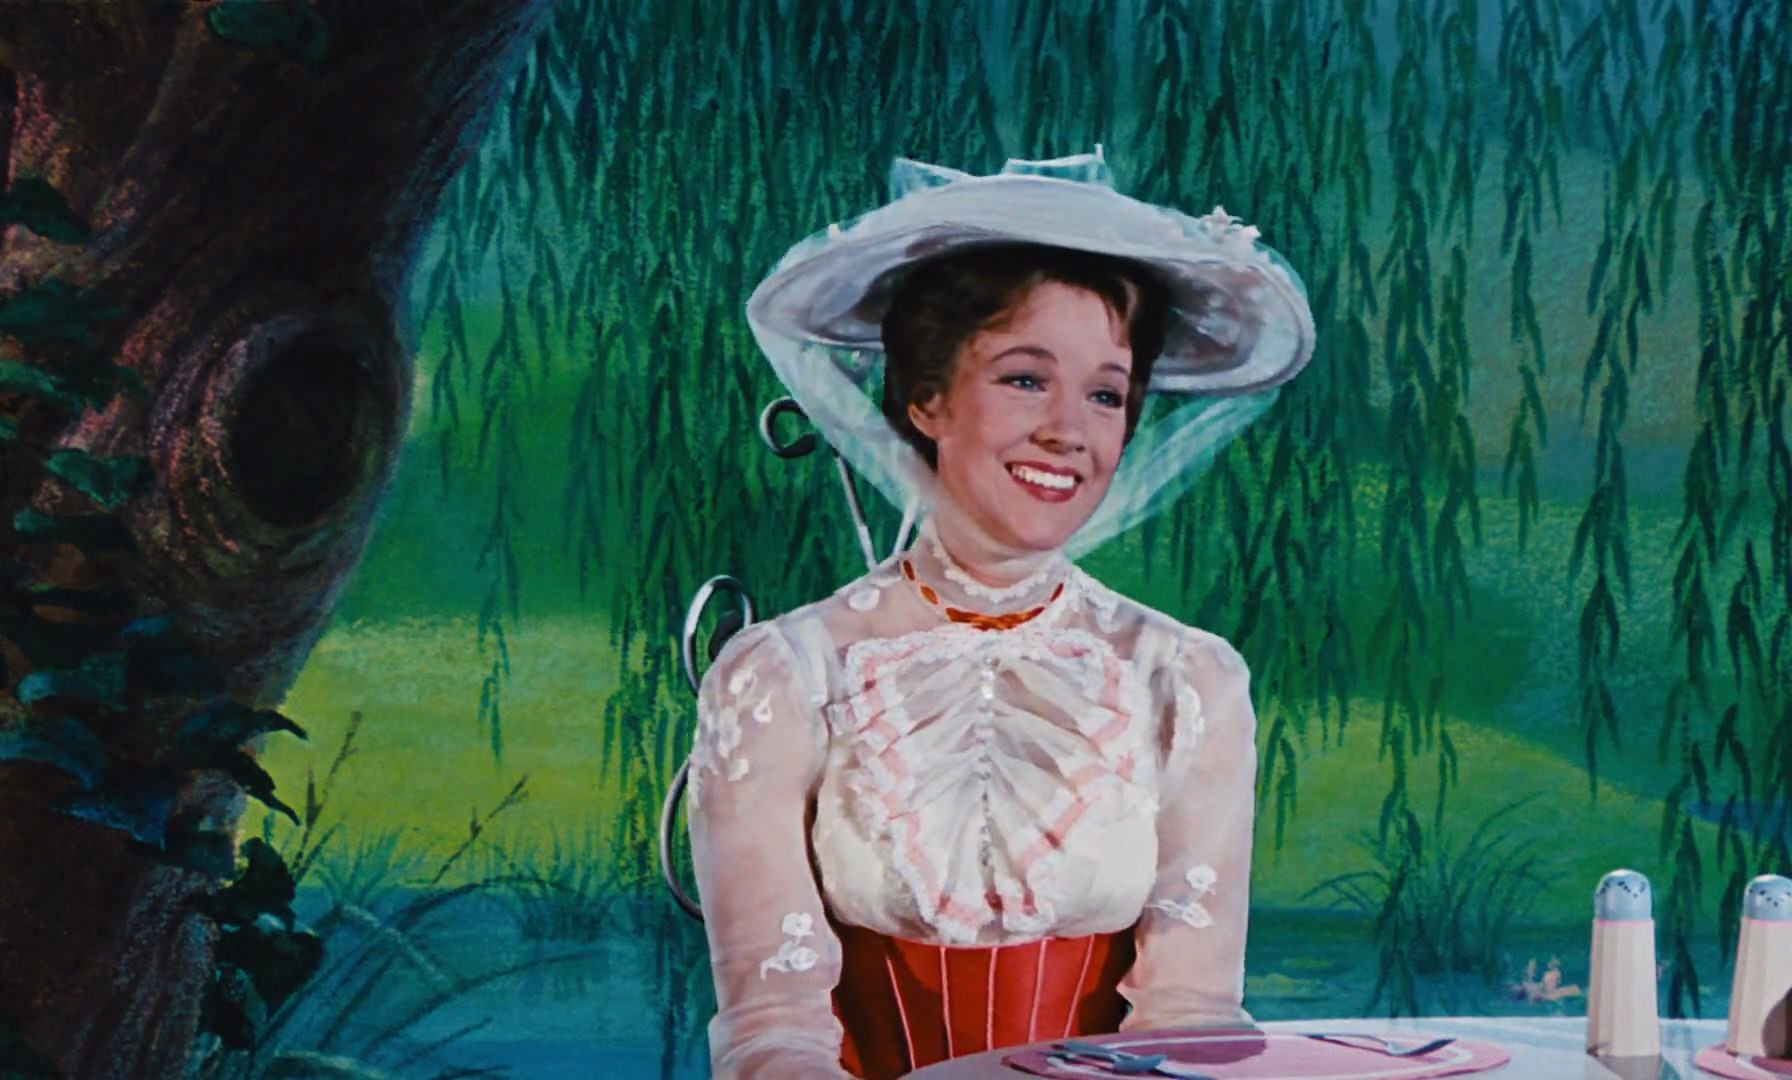 File:Mary Poppins8.jpg